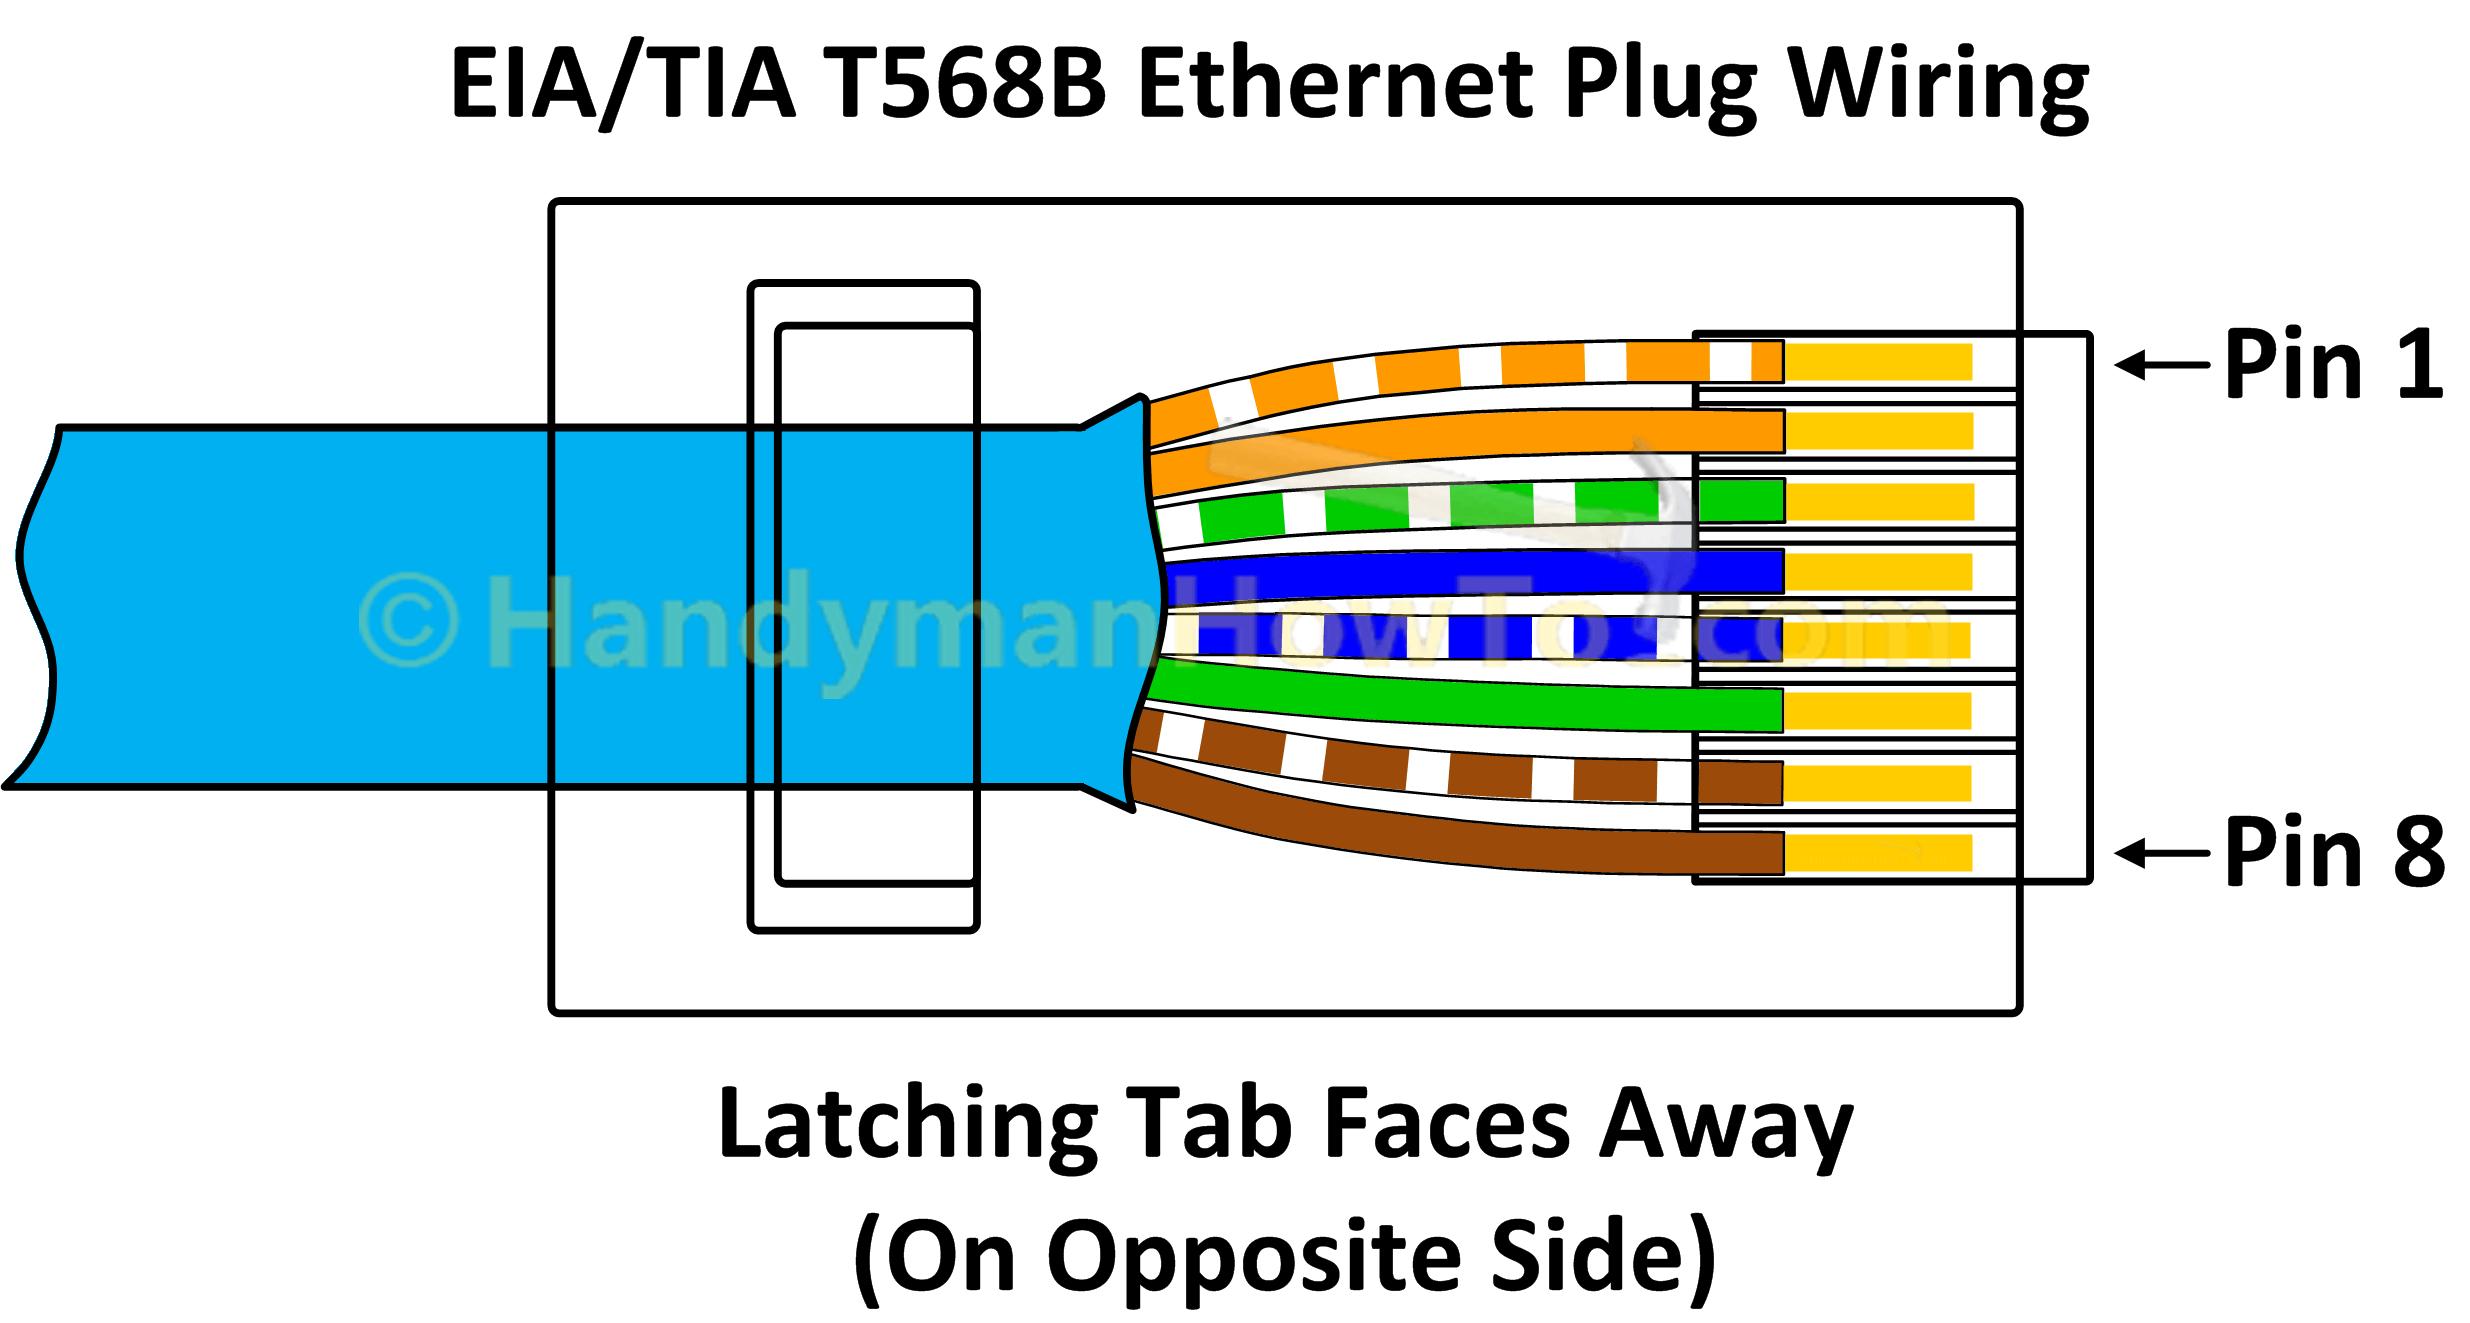 How To Wire A Cat6 Rj45 Ethernet Plug - Handymanhowto - Plug Wiring Diagram